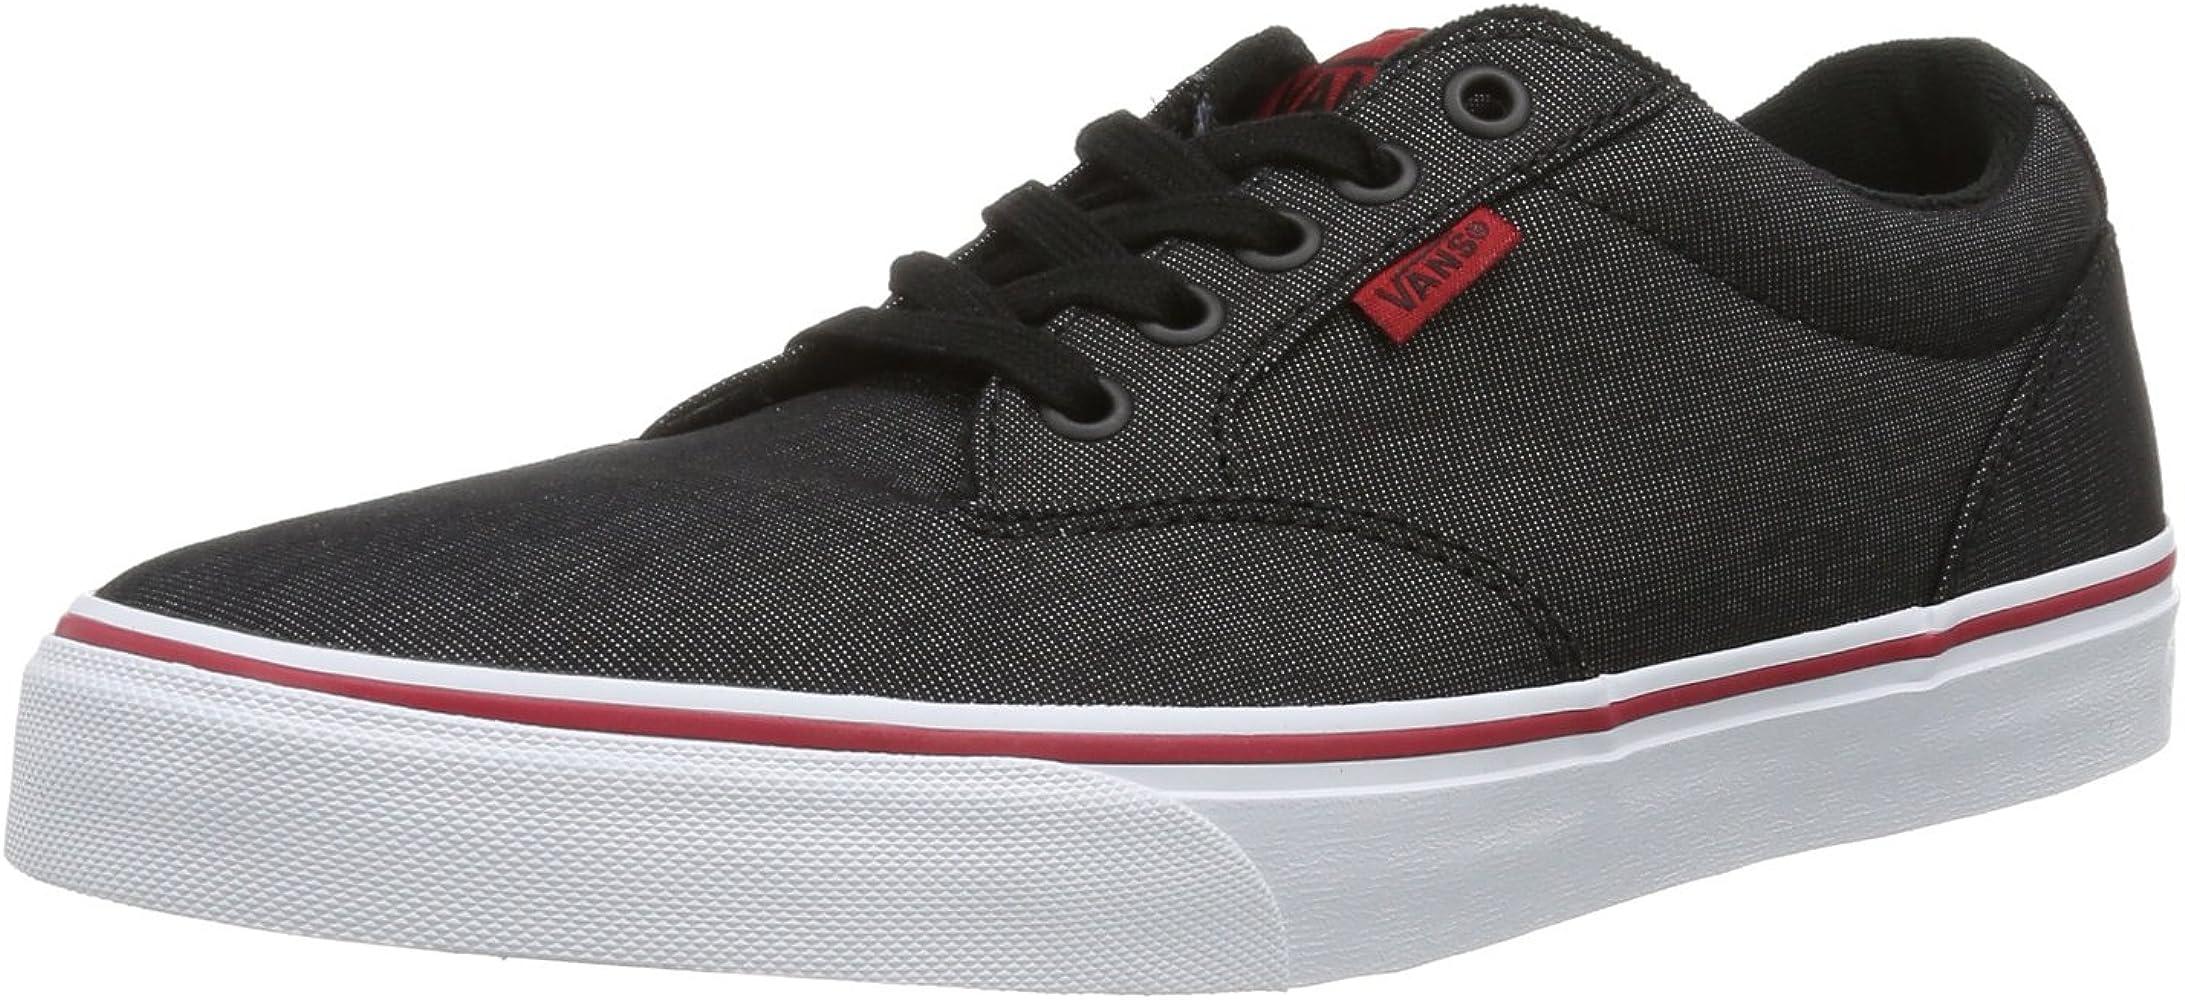 Vans Black Winston Skate Shoes - Men